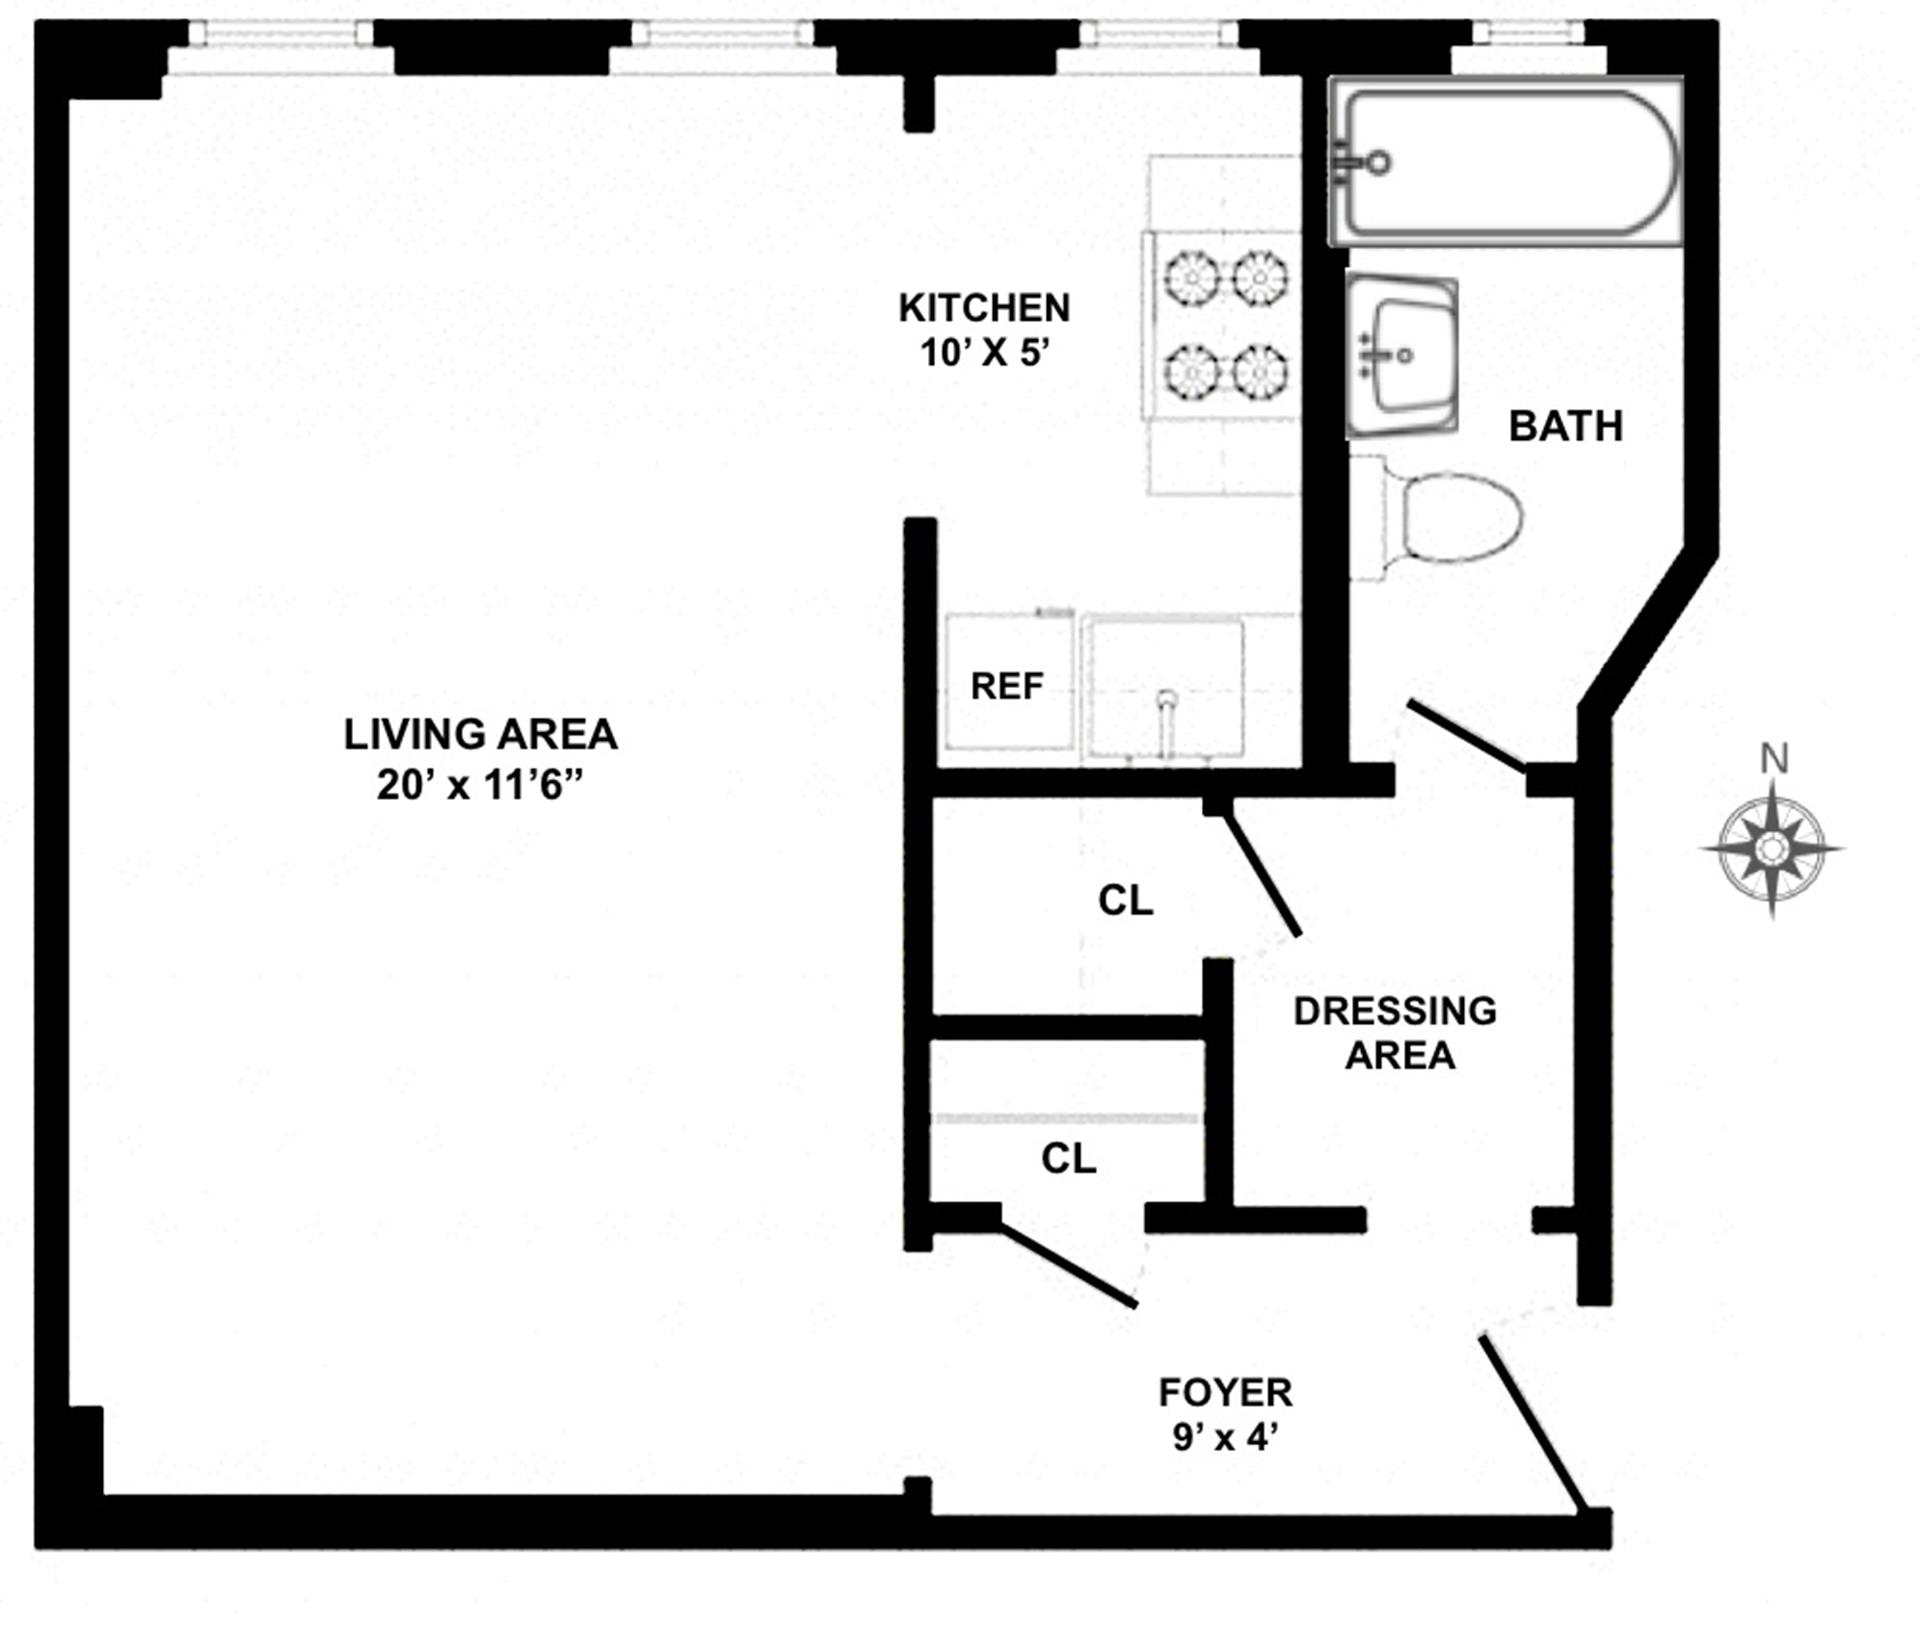 Floor plan of 129 West 89th St, 38 - Upper West Side, New York